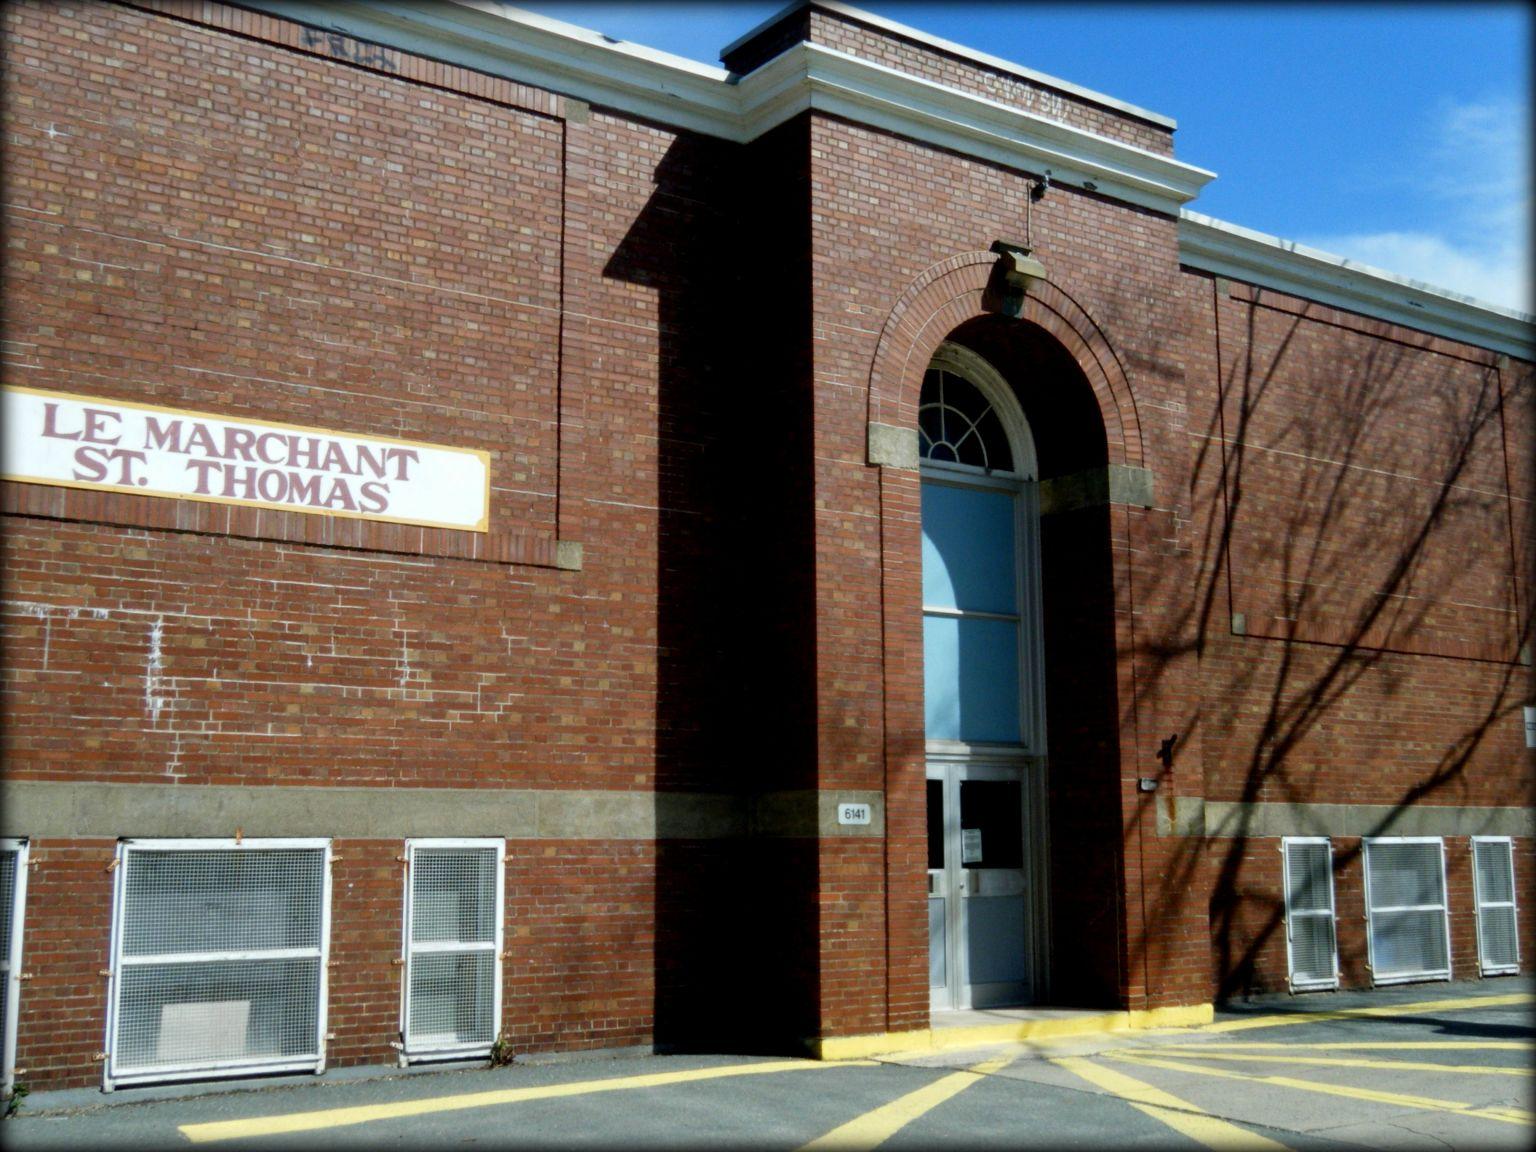 Entrance Examination Old School Style Noticed In Nova